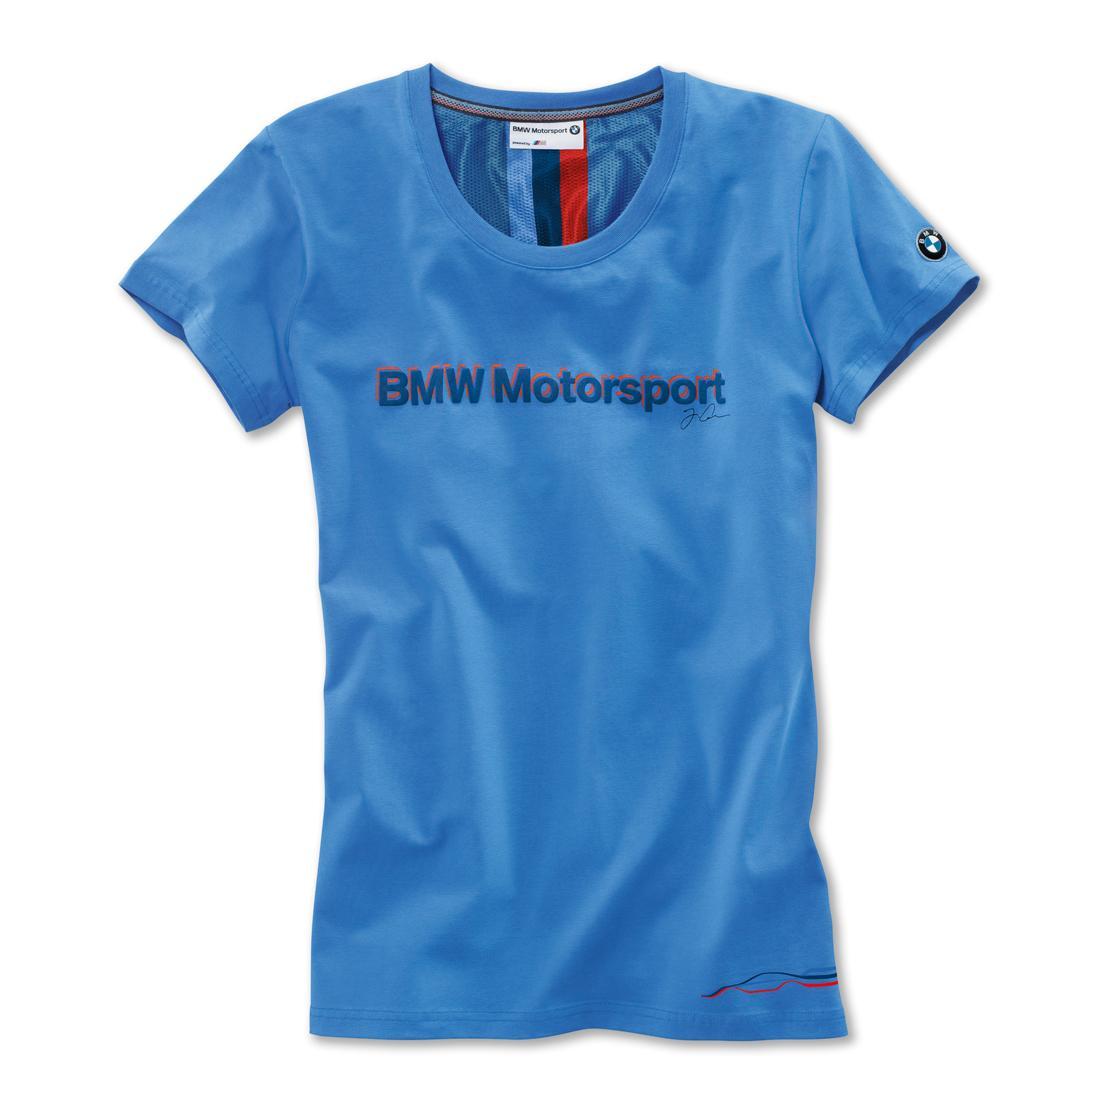 8d32f84b ShopBMWUSA.com: BMW MOTORSPORT LADIES' FAN SHIRT